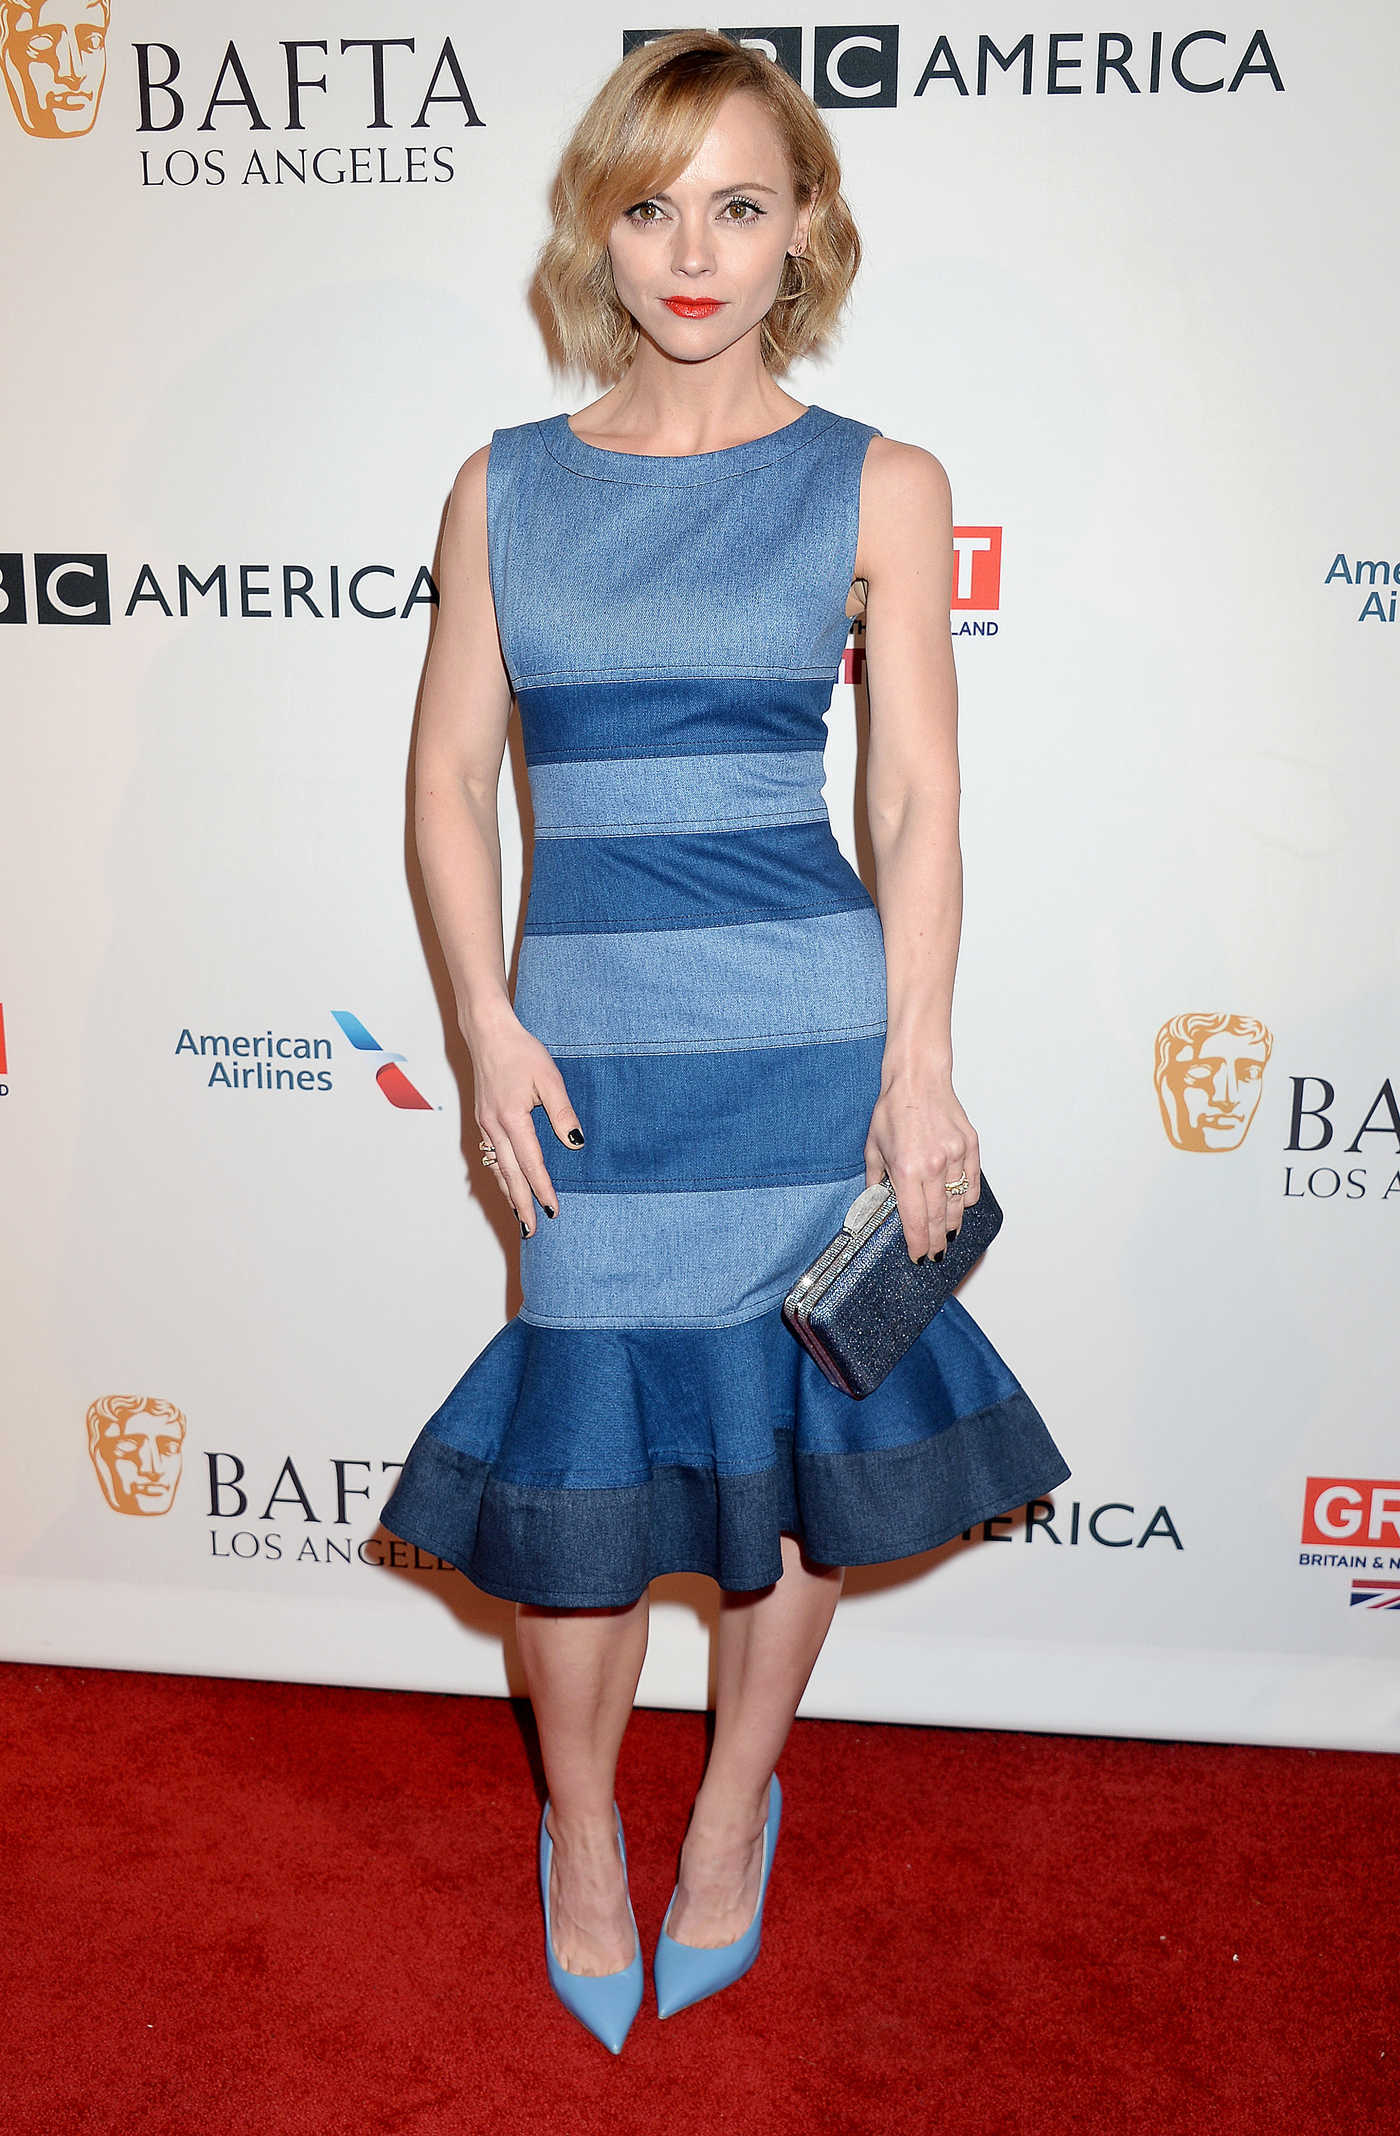 Christina Ricci at the BAFTA Tea Party at Four Seasons Hotel in Los Angeles 01/07/2017